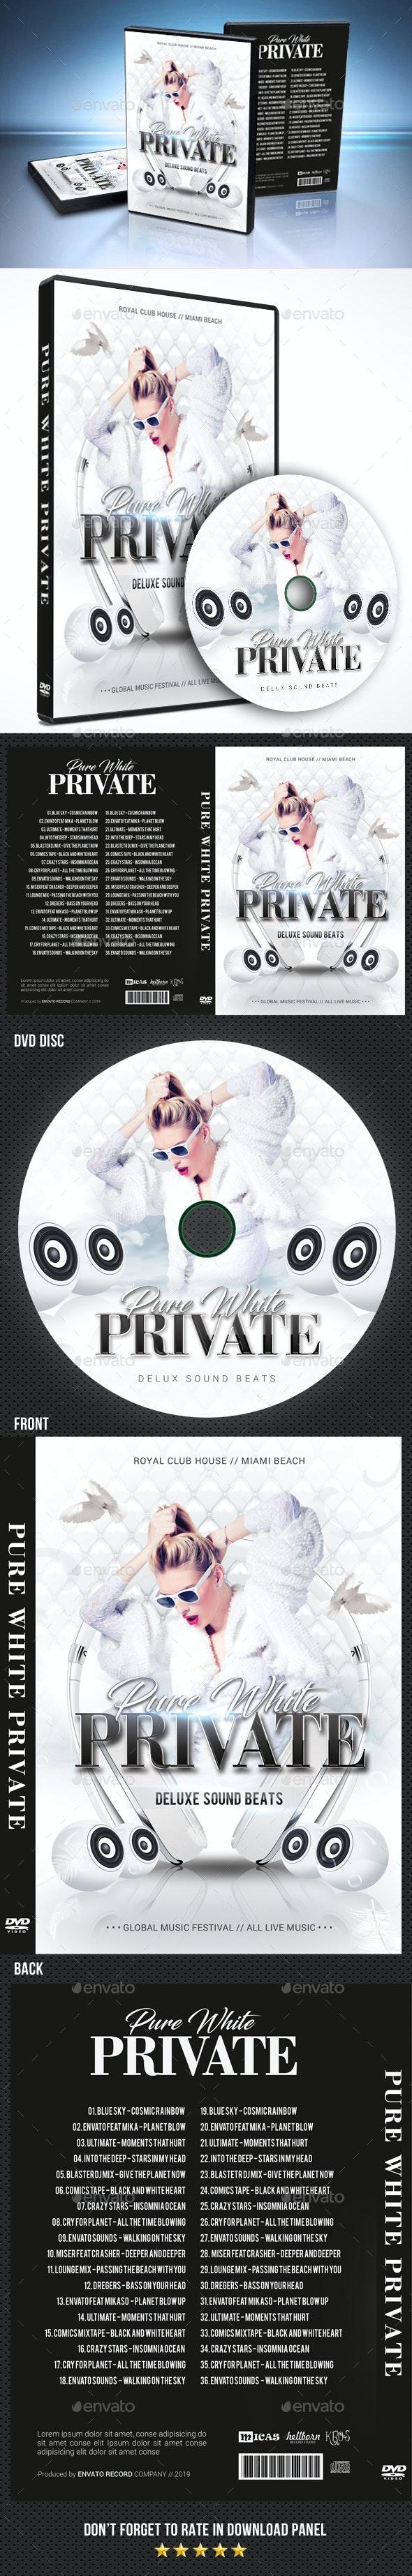 Pure White DVD Cover Template - CD & DVD Artwork Print Templates